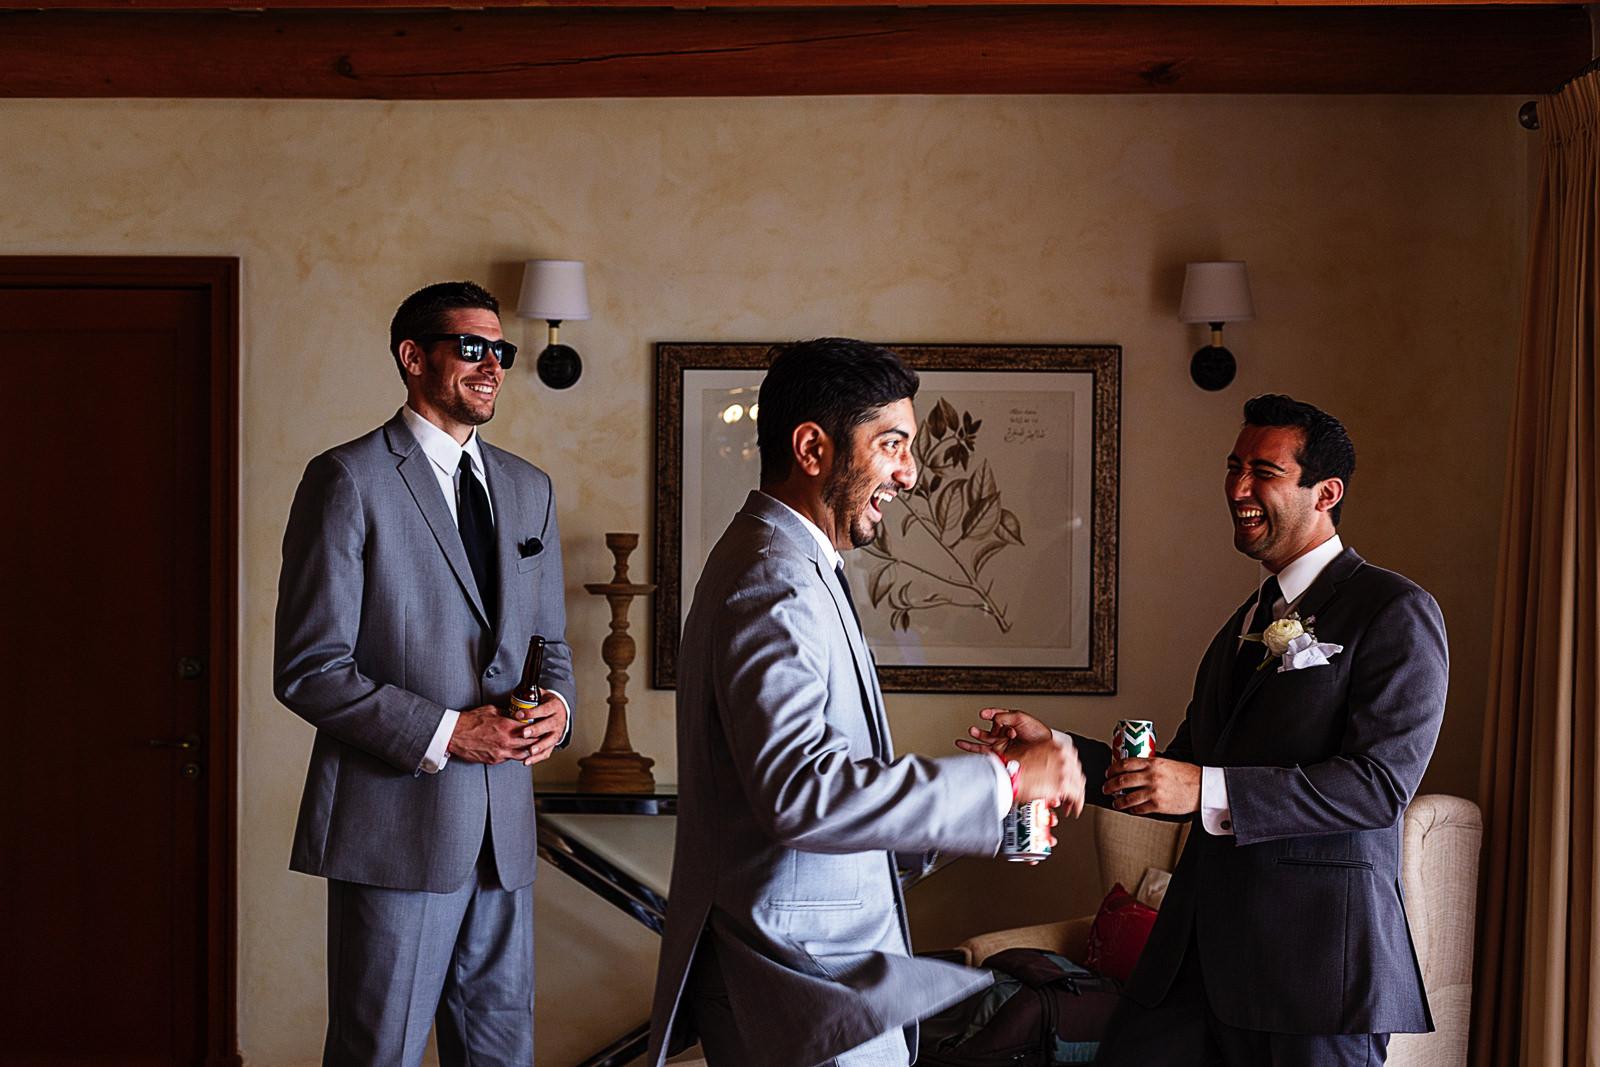 Groom and groomsmens having fun on the guy's room.